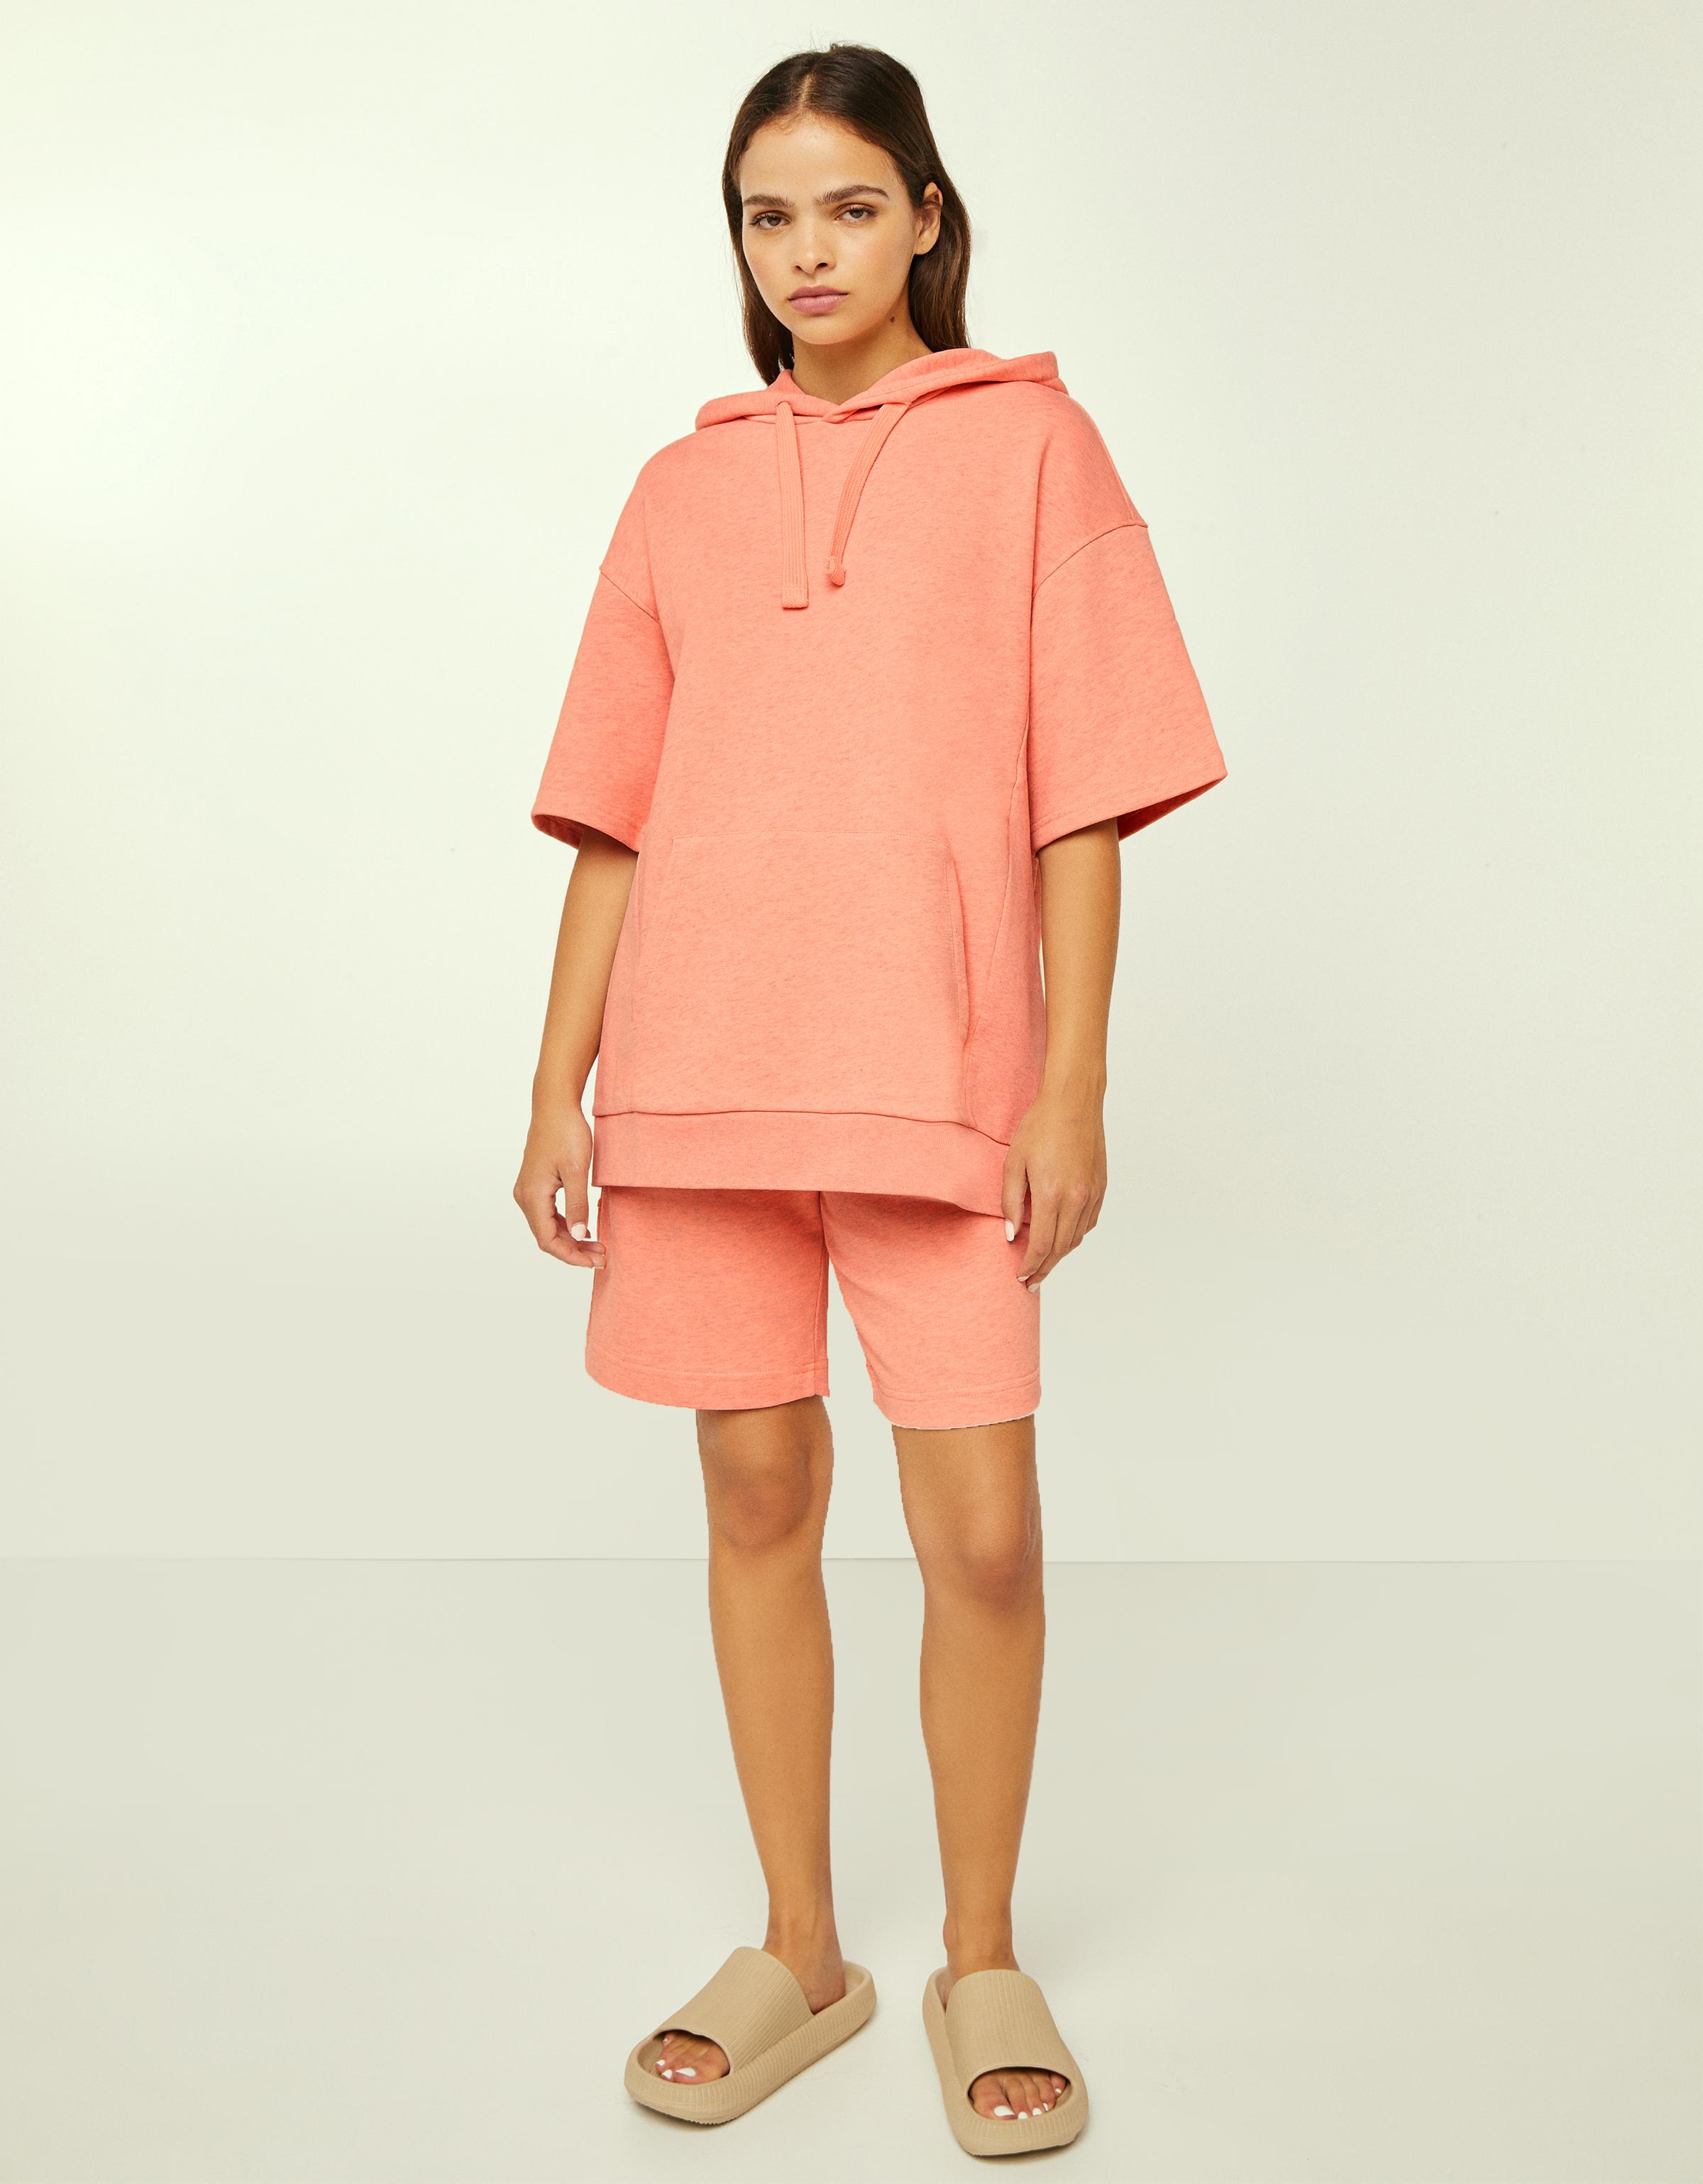 Sudadera capucha manga corta B3